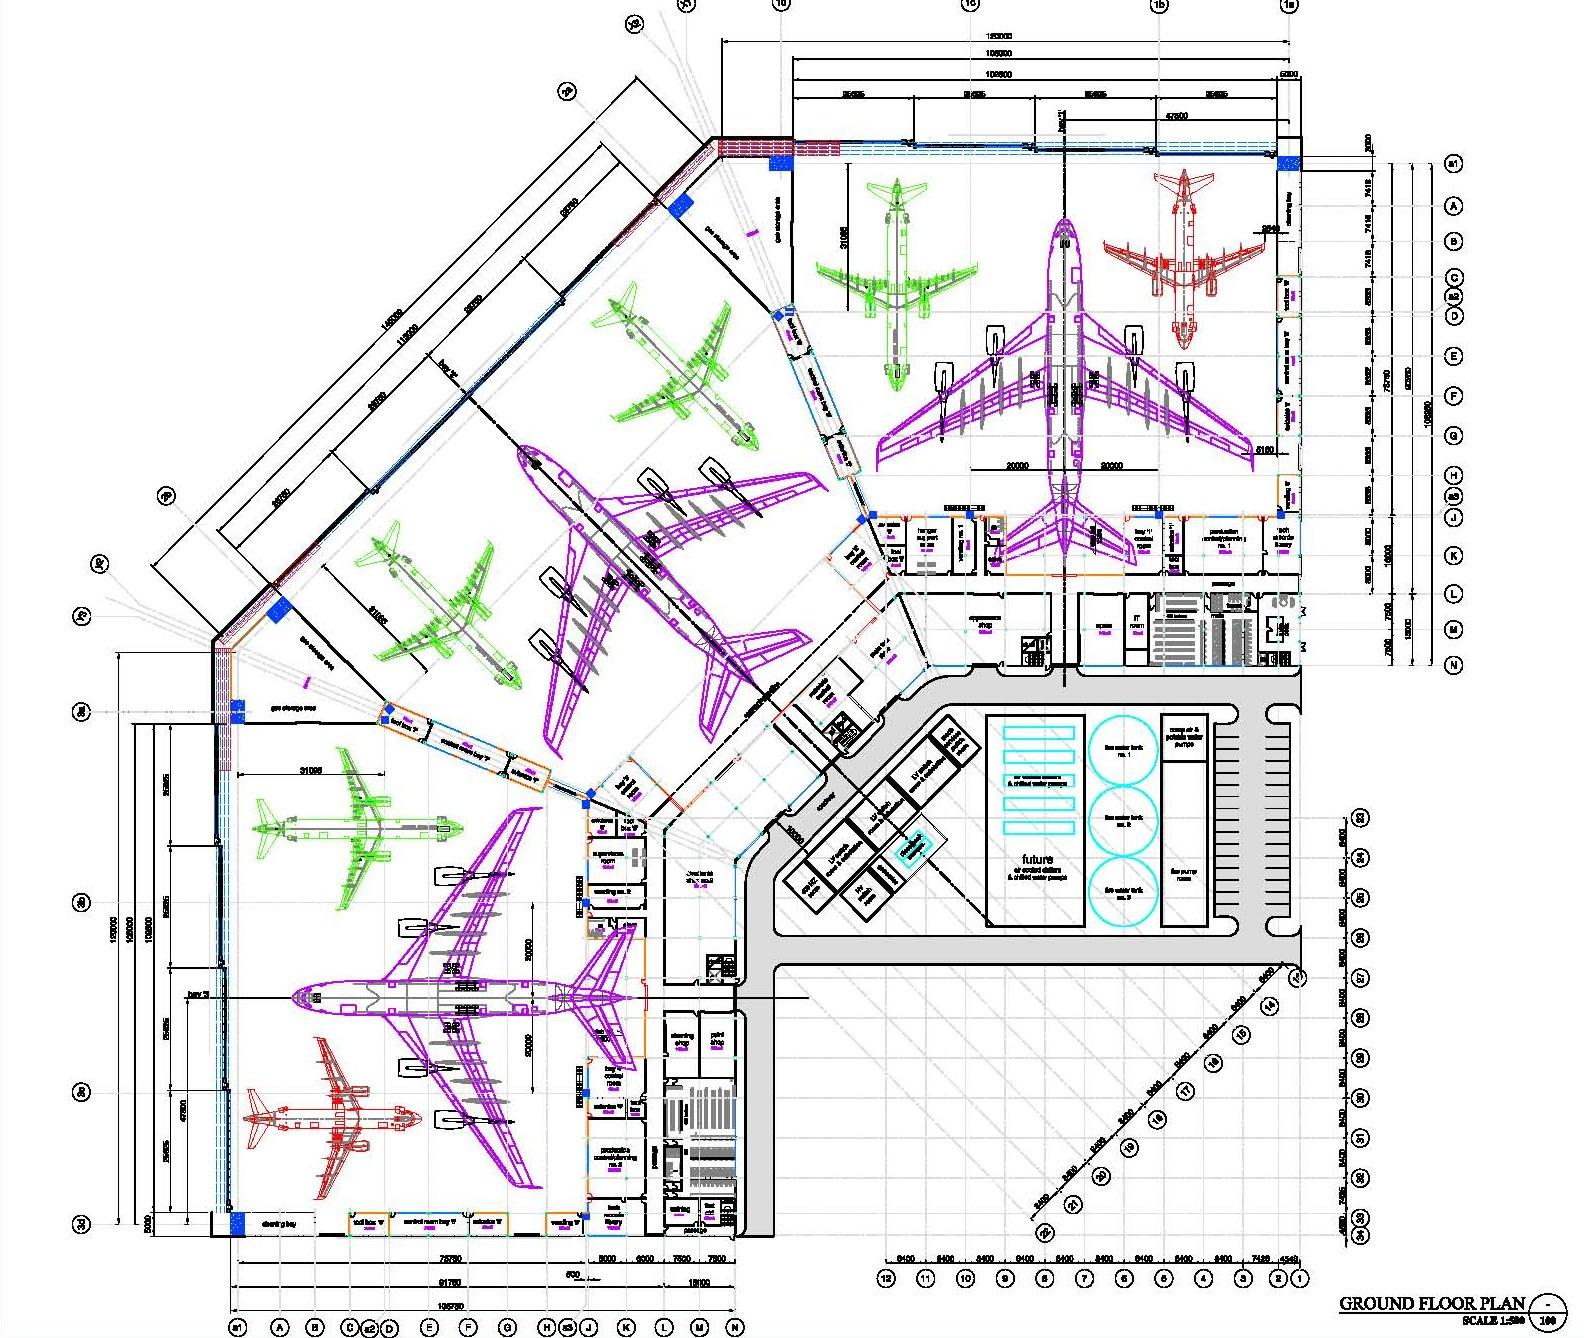 Aircraft Hangar Construction